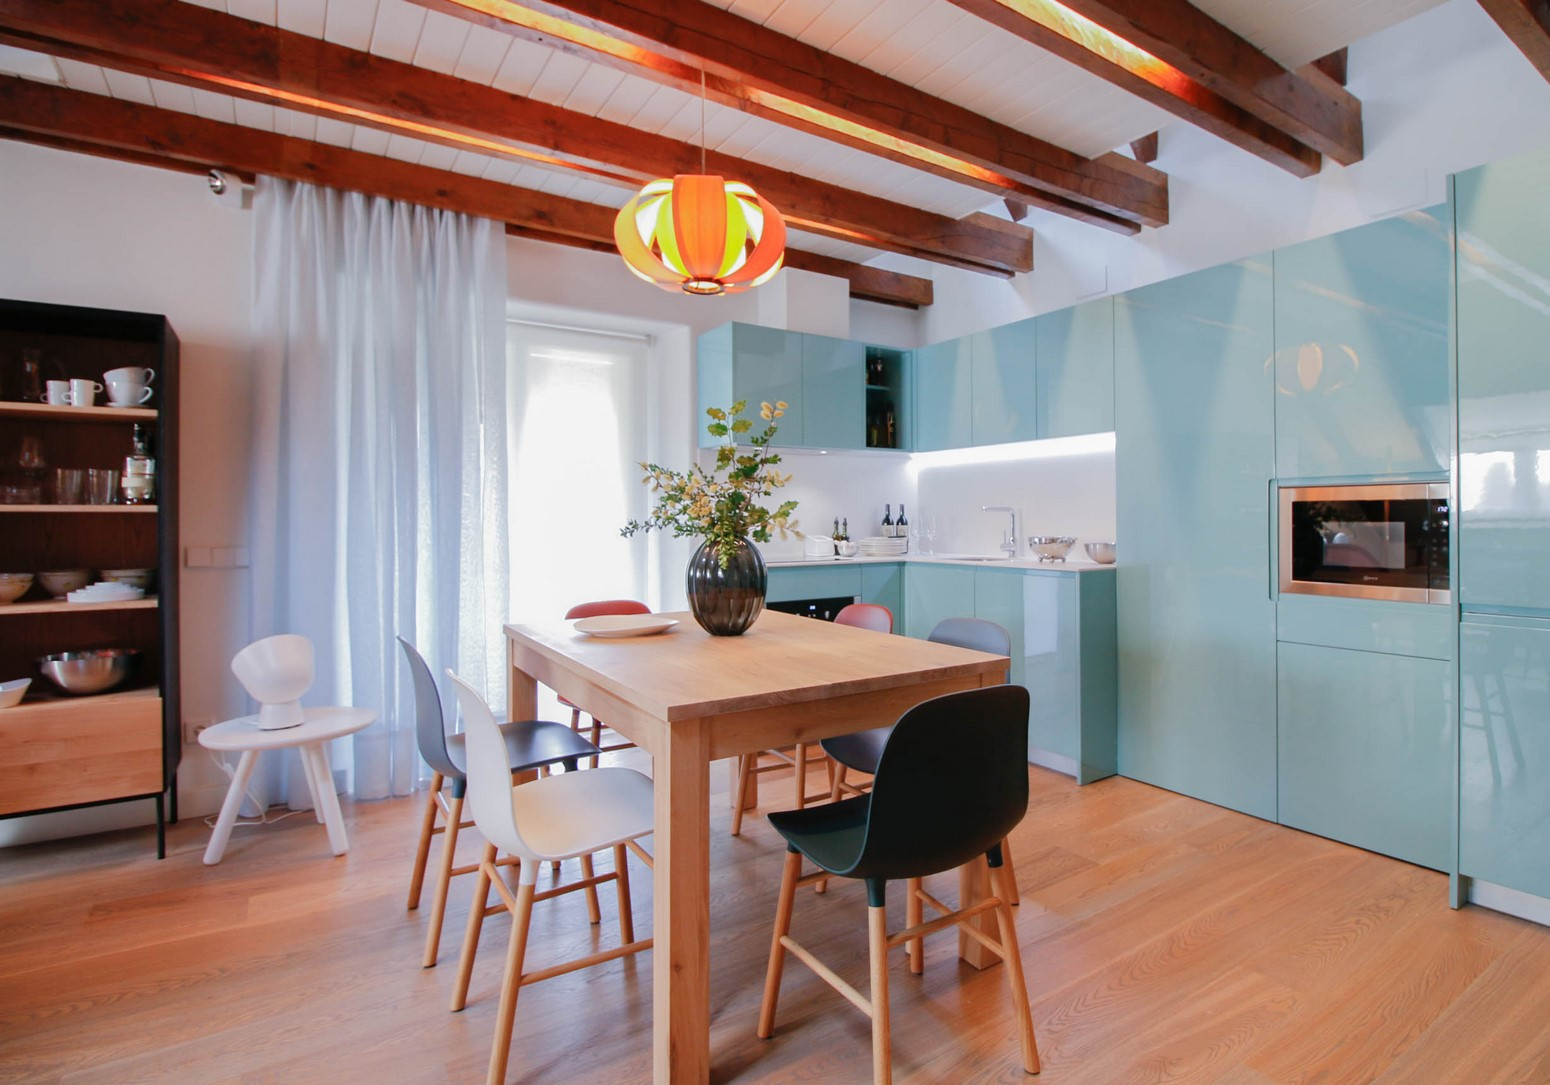 Apartamento-benasque-pedro-feduchi-diariodesign-23